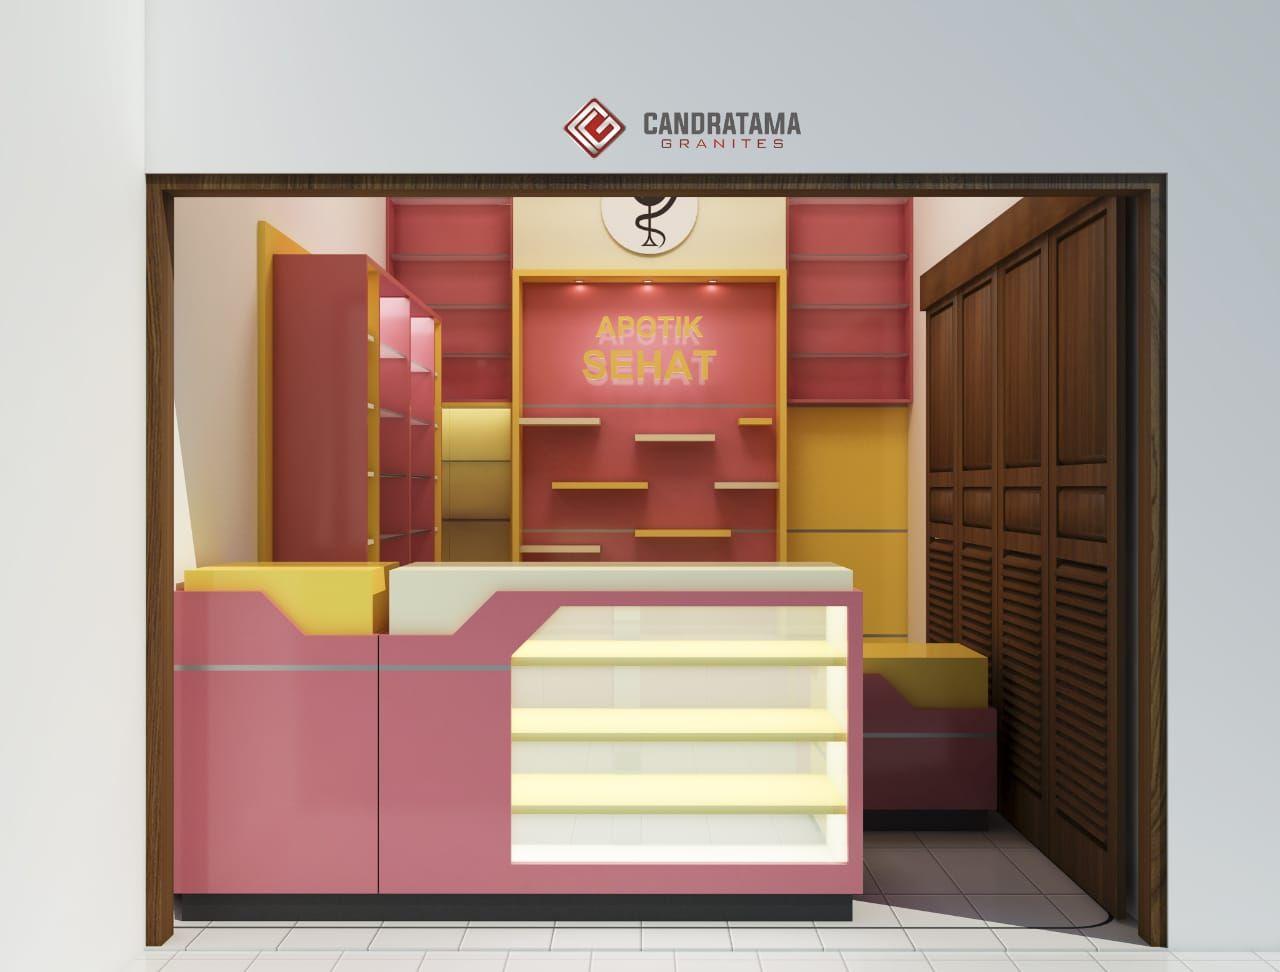 Desain Interior Apotek Modern Cek Bahan Bangunan Desain interior apotek minimalis